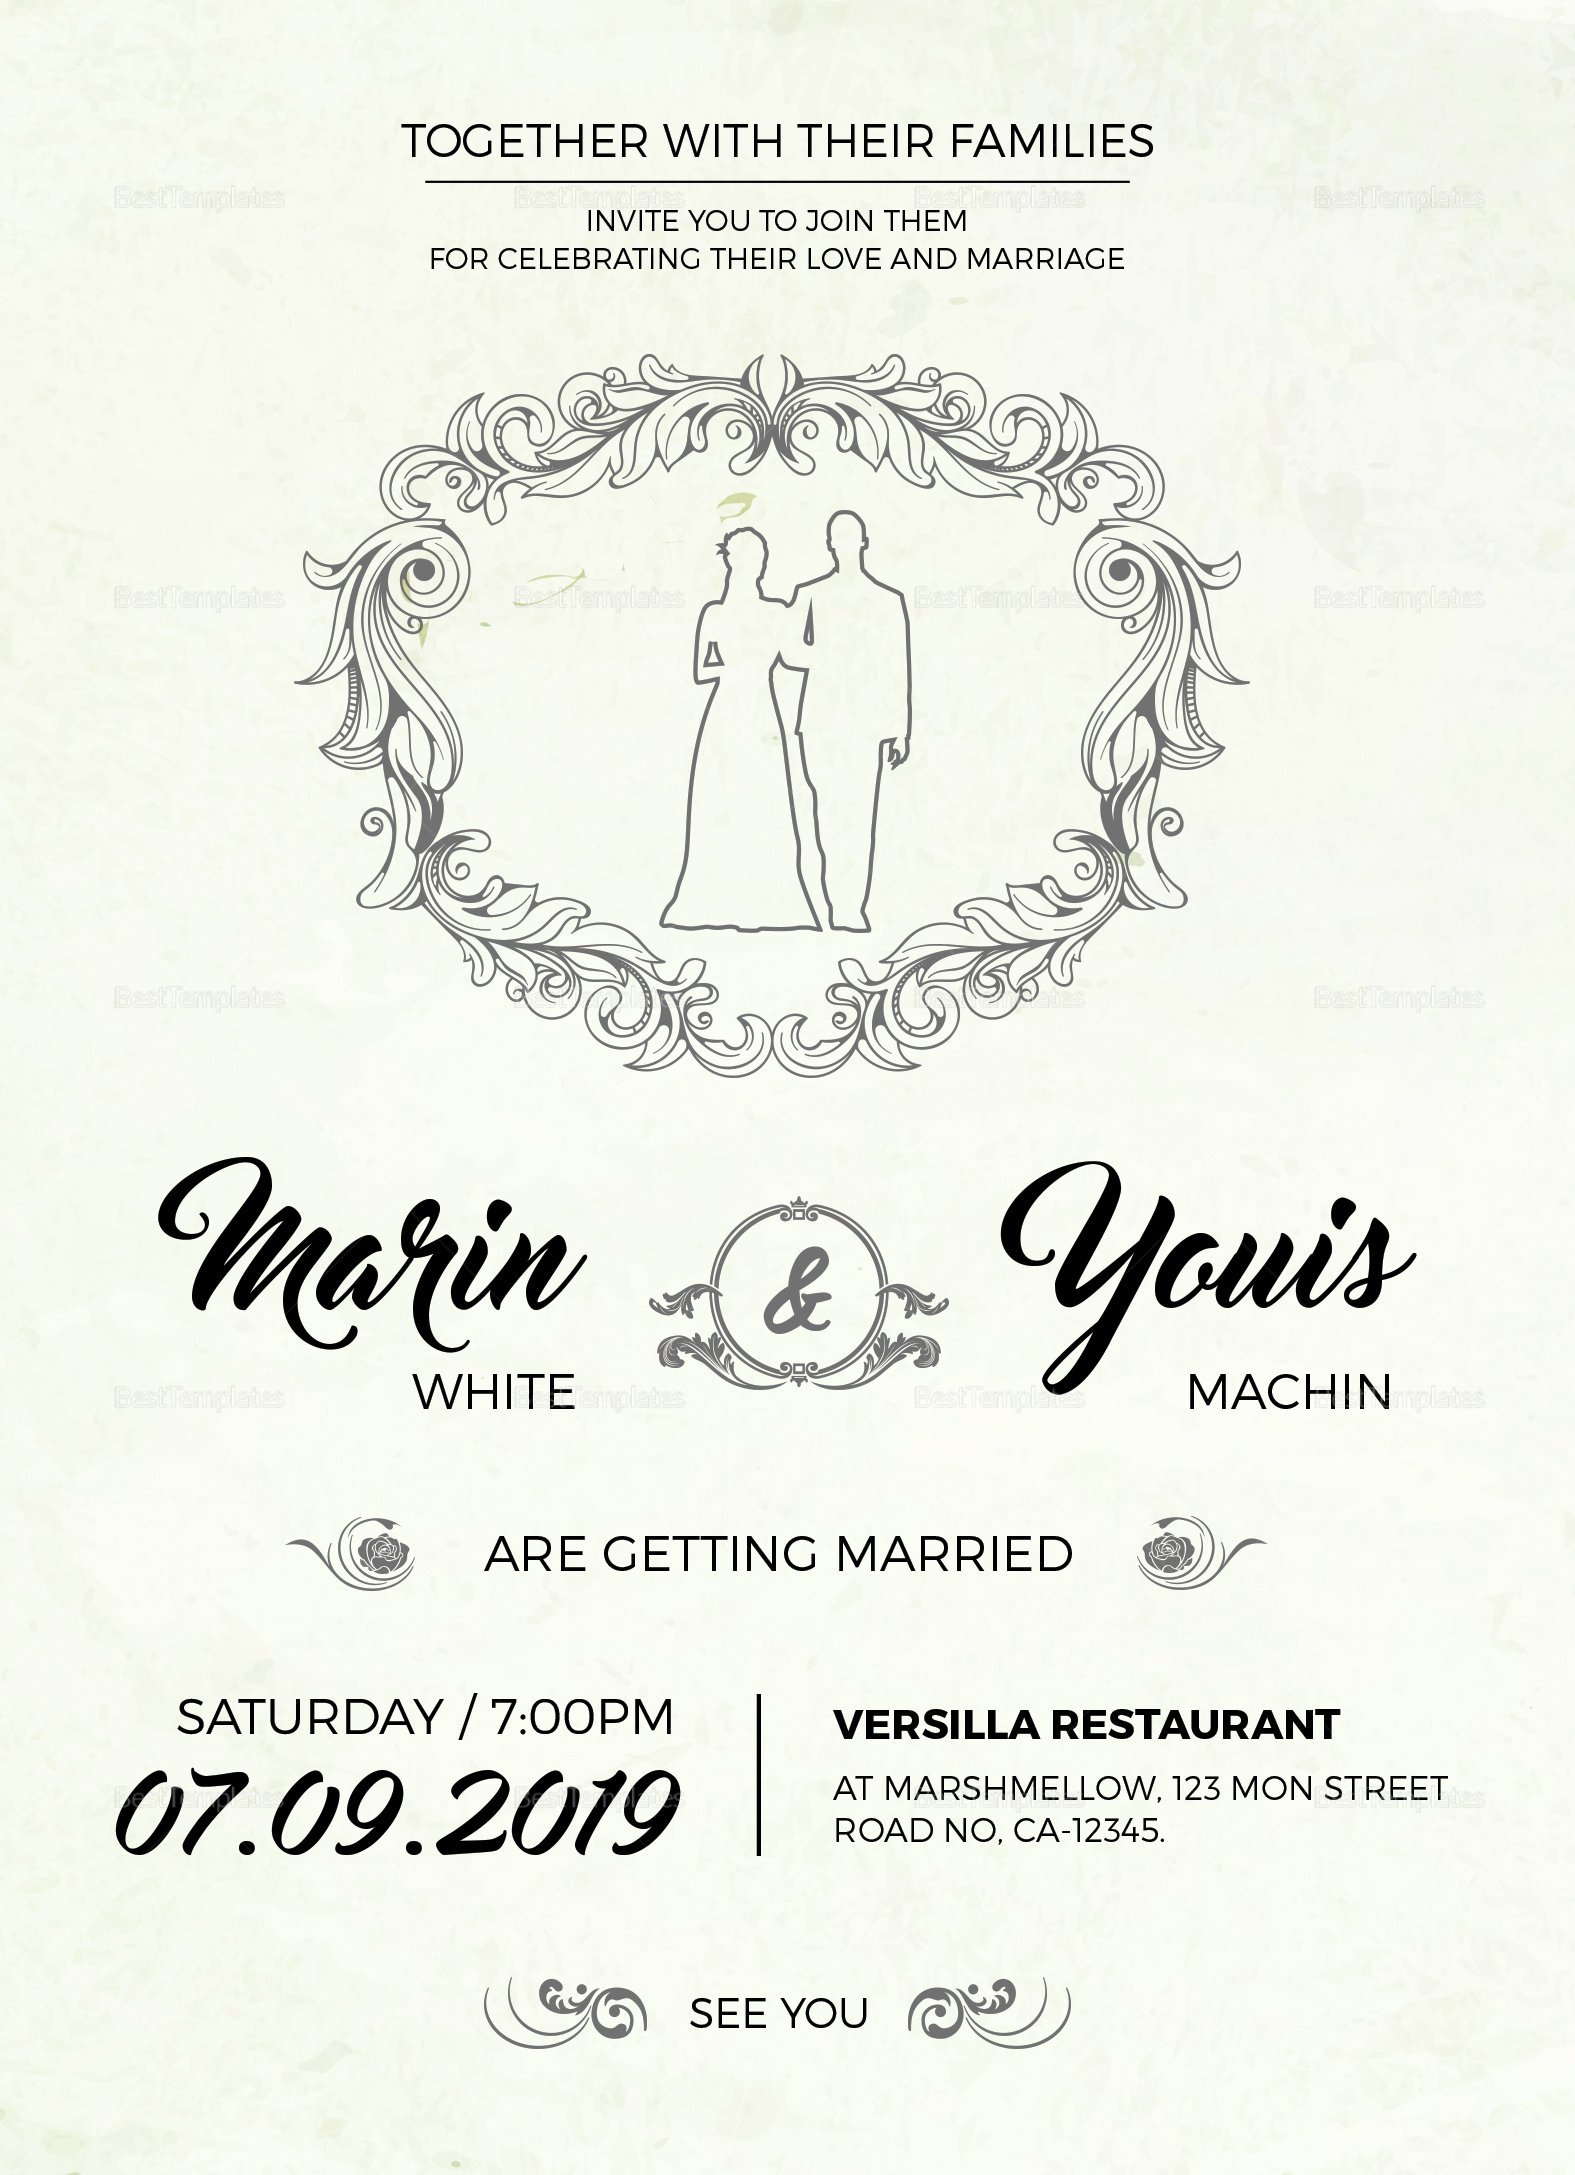 Modern Wedding Invitation Template Awesome Modern Wedding Invitation Design Template In Word Psd